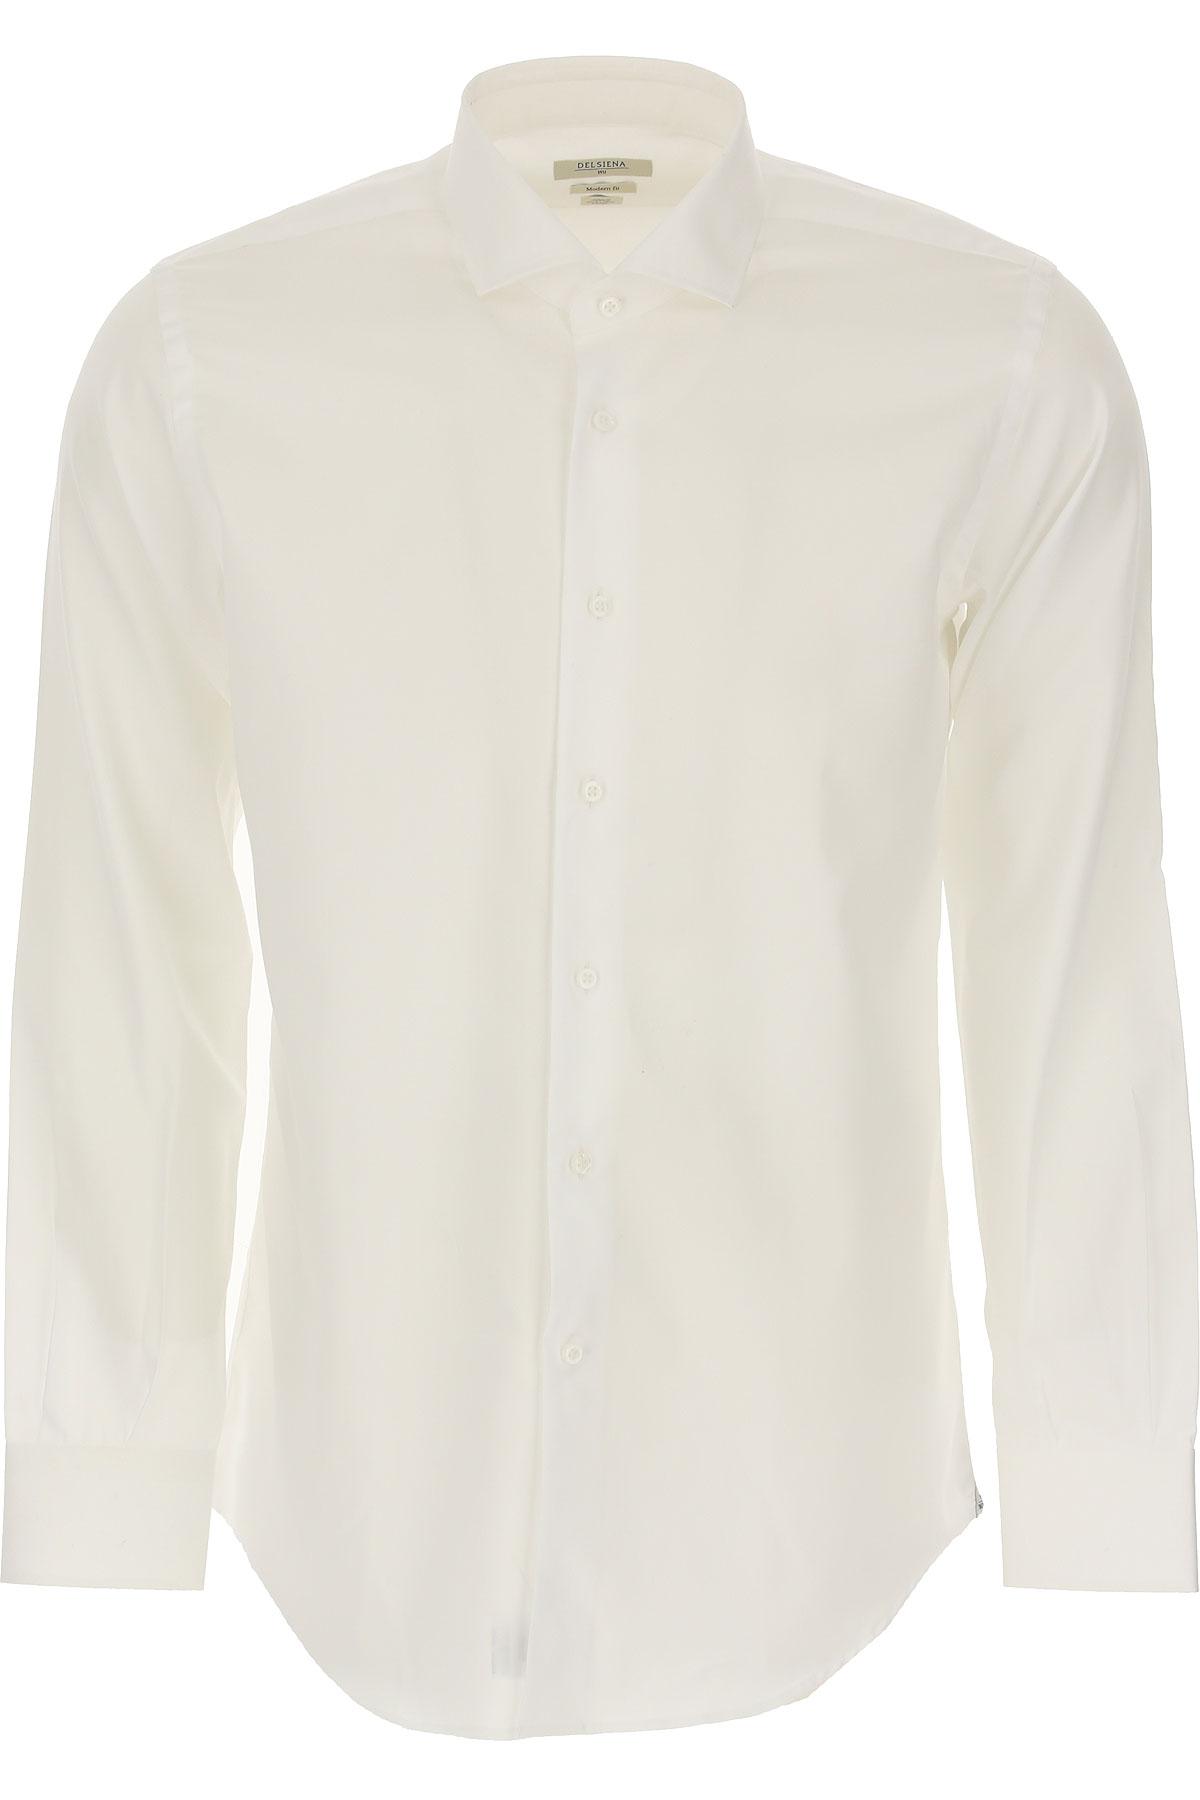 Del Siena Shirt for Men On Sale, White, Cotton, 2019, 15.5 15.75 16 17